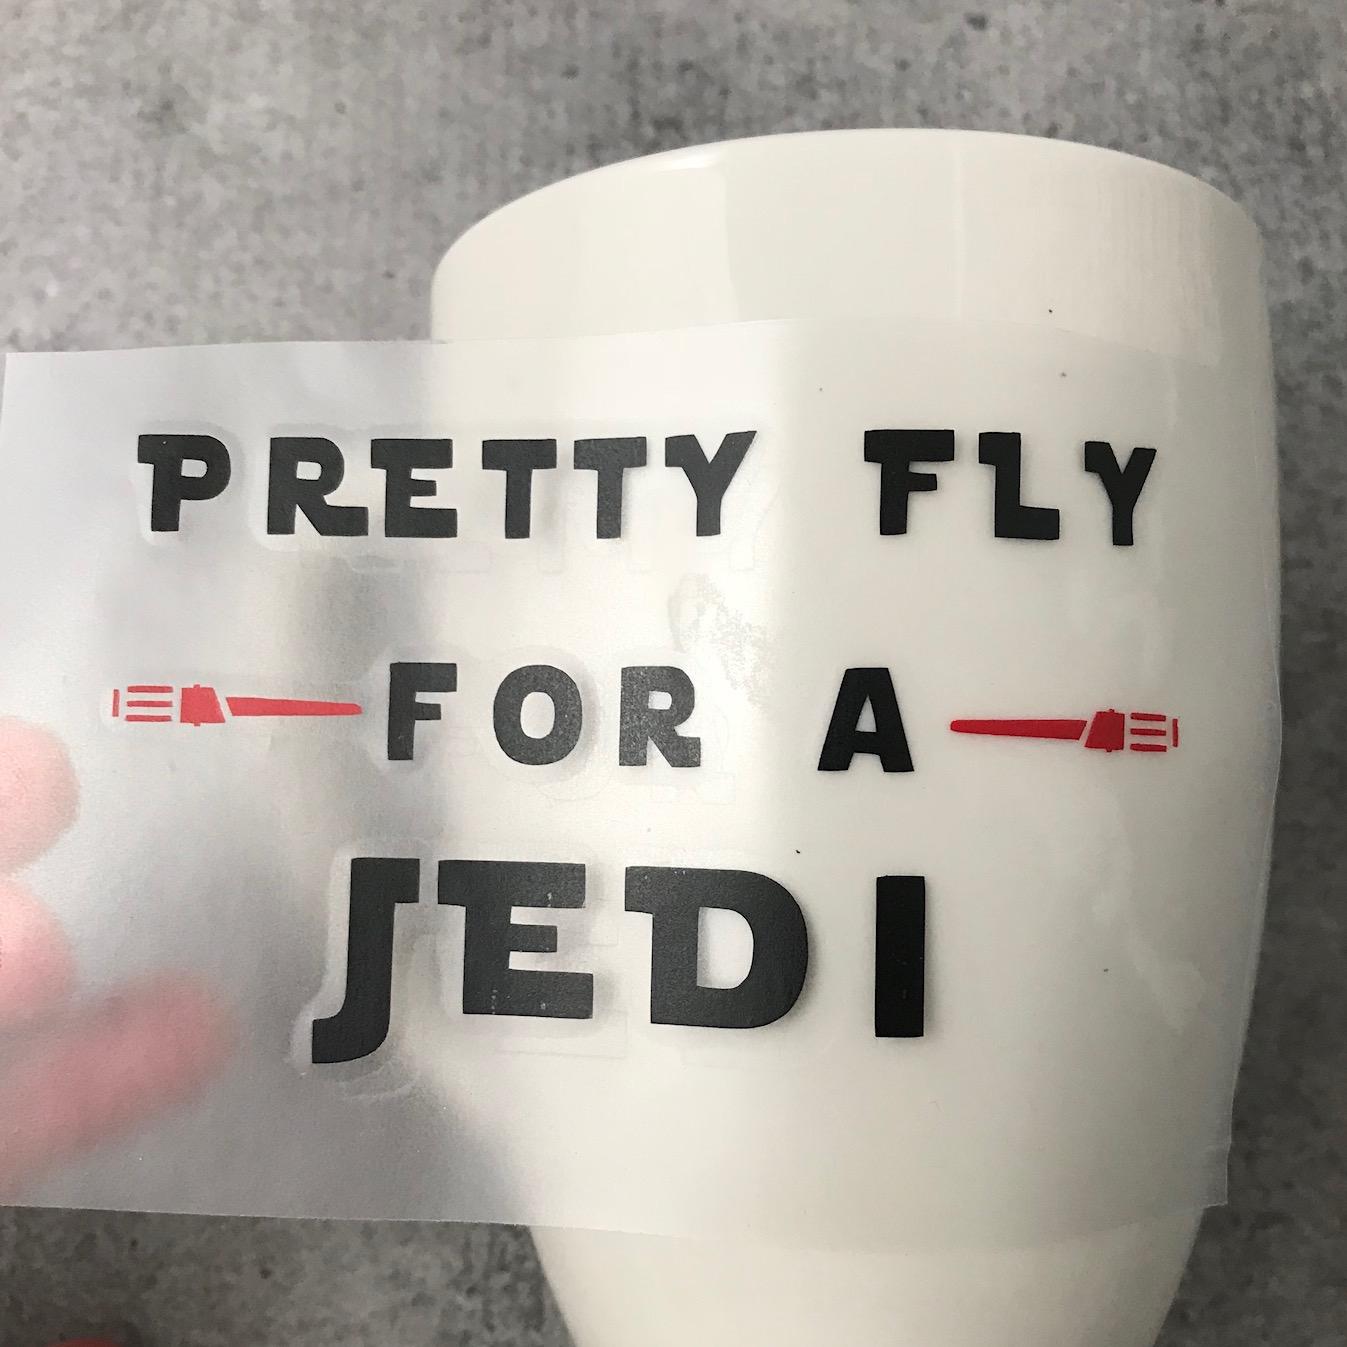 Star Wars Valentine's Day, Star Wars Valentine's Day Idea, Star Wars Mug, DIY Star Wars Mug